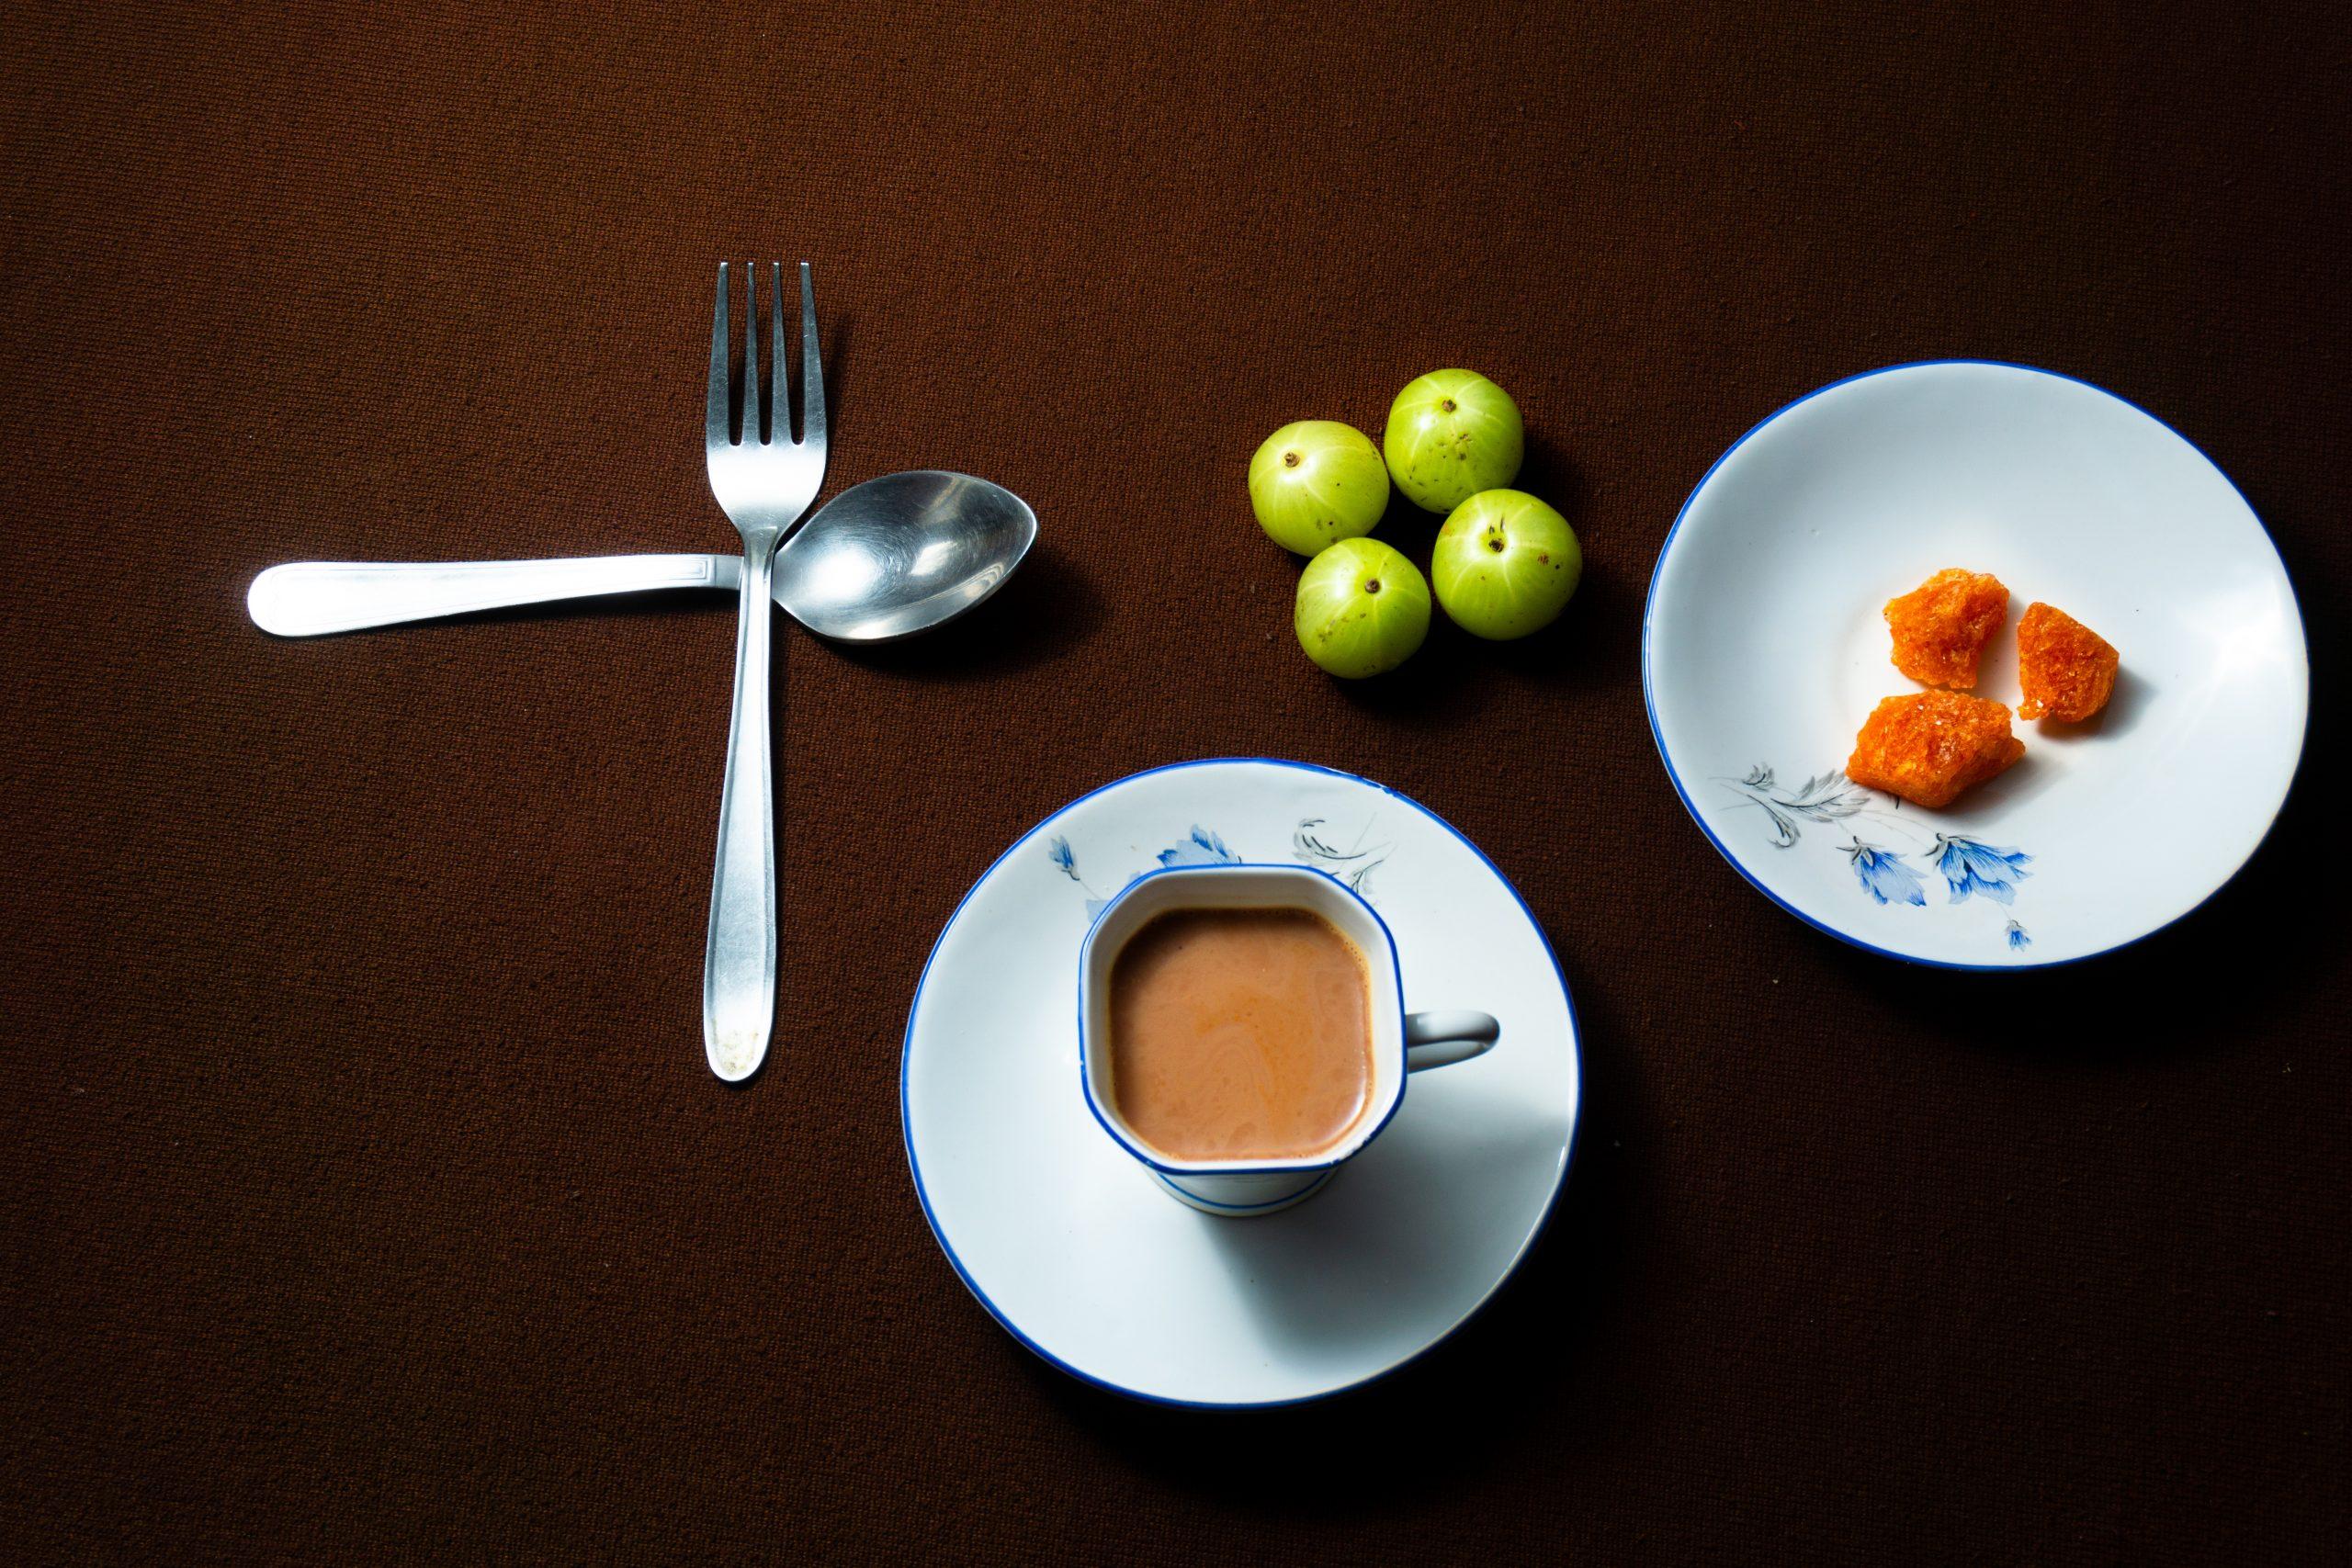 Tea and cutlery